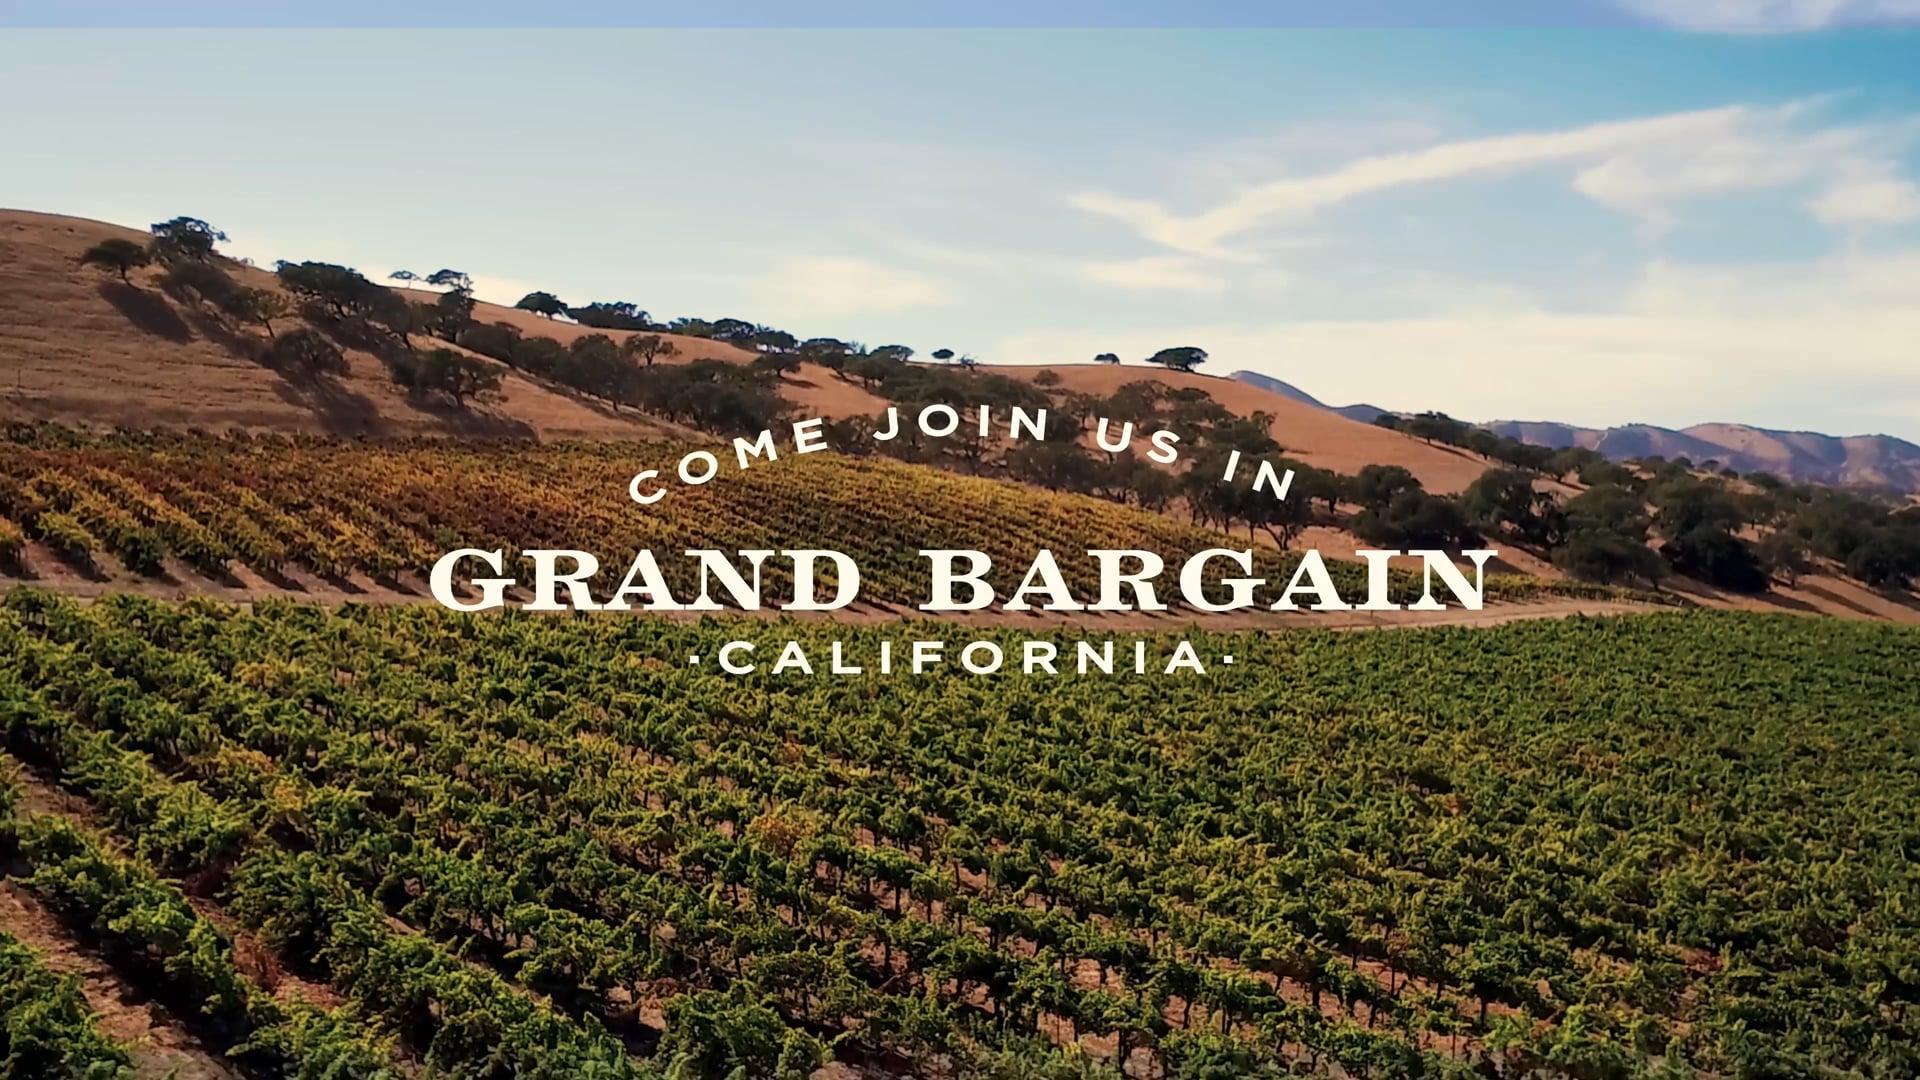 Grand Bargain, California